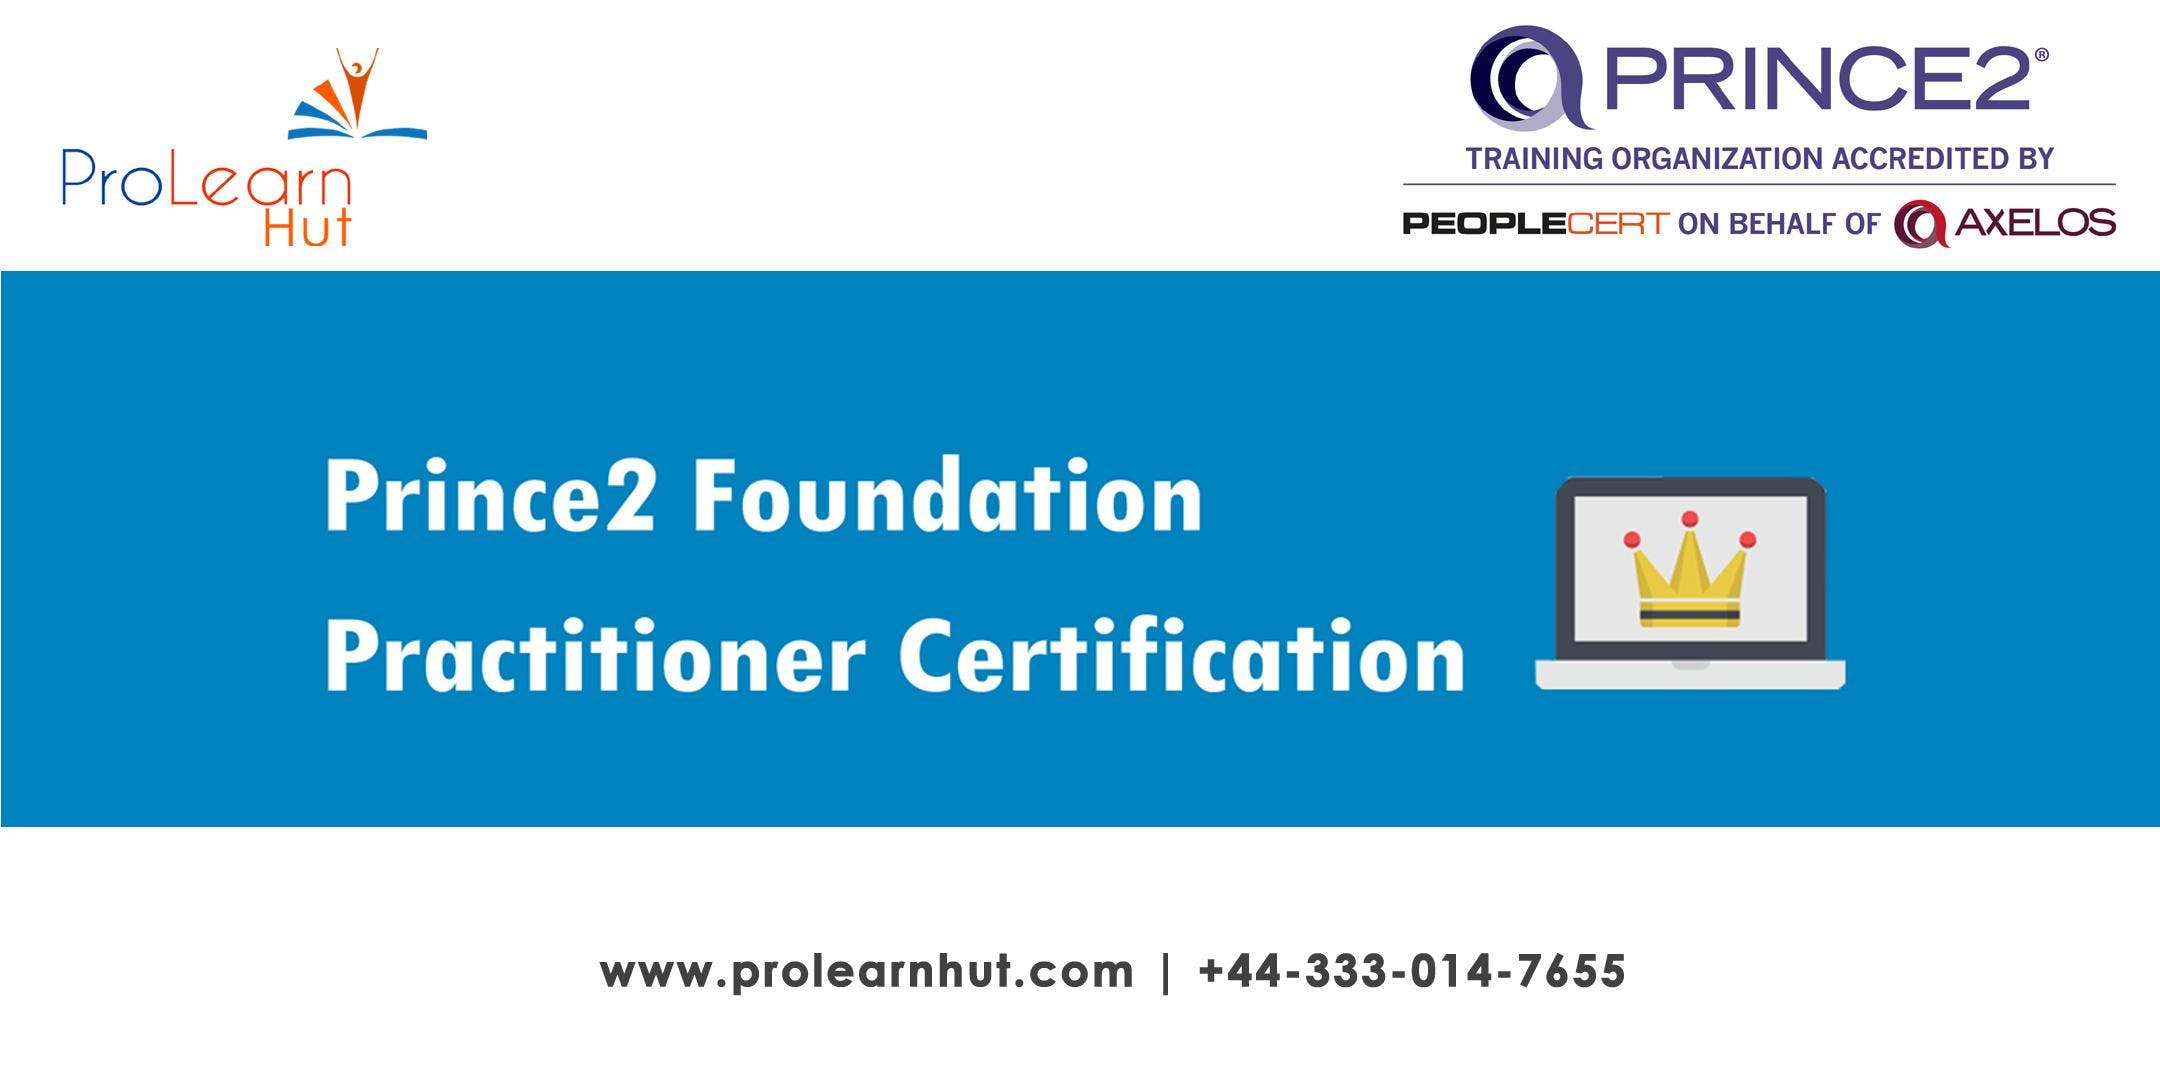 PRINCE2 Training Class | PRINCE2  F & P Class